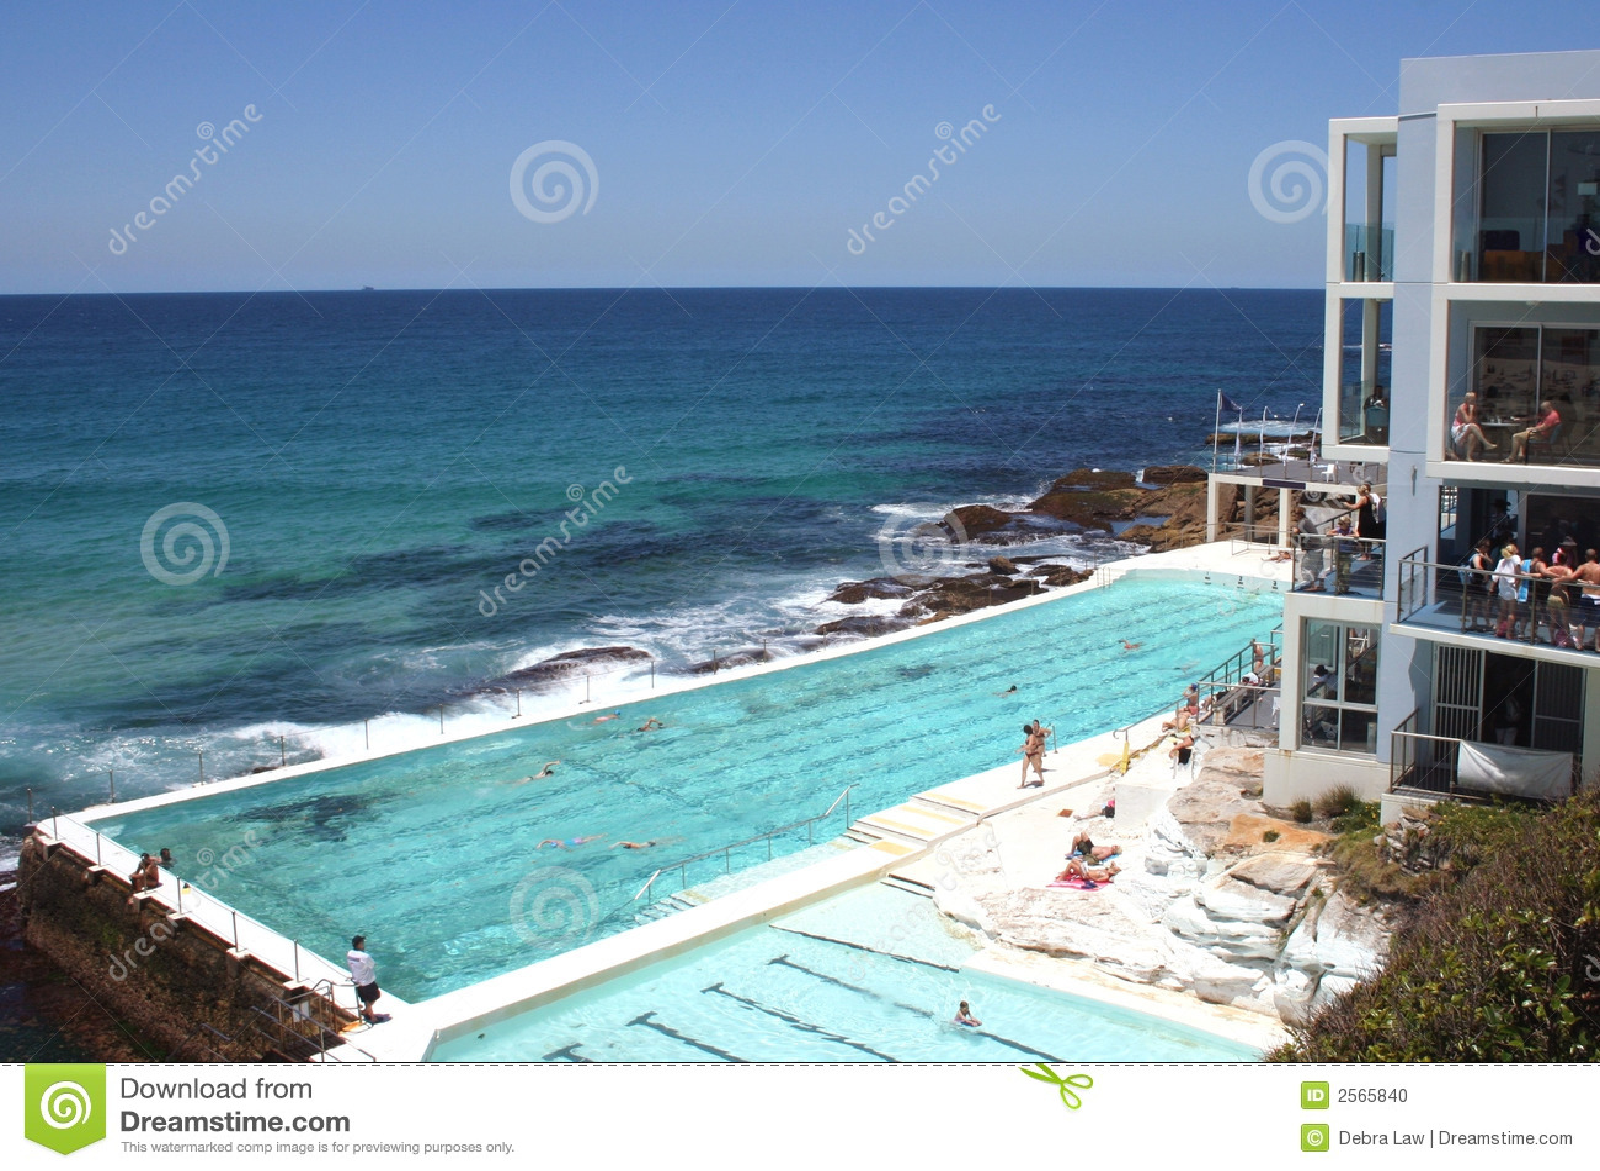 Piscina sydney de la playa de bondi foto de archivo - Piscina de playa ...